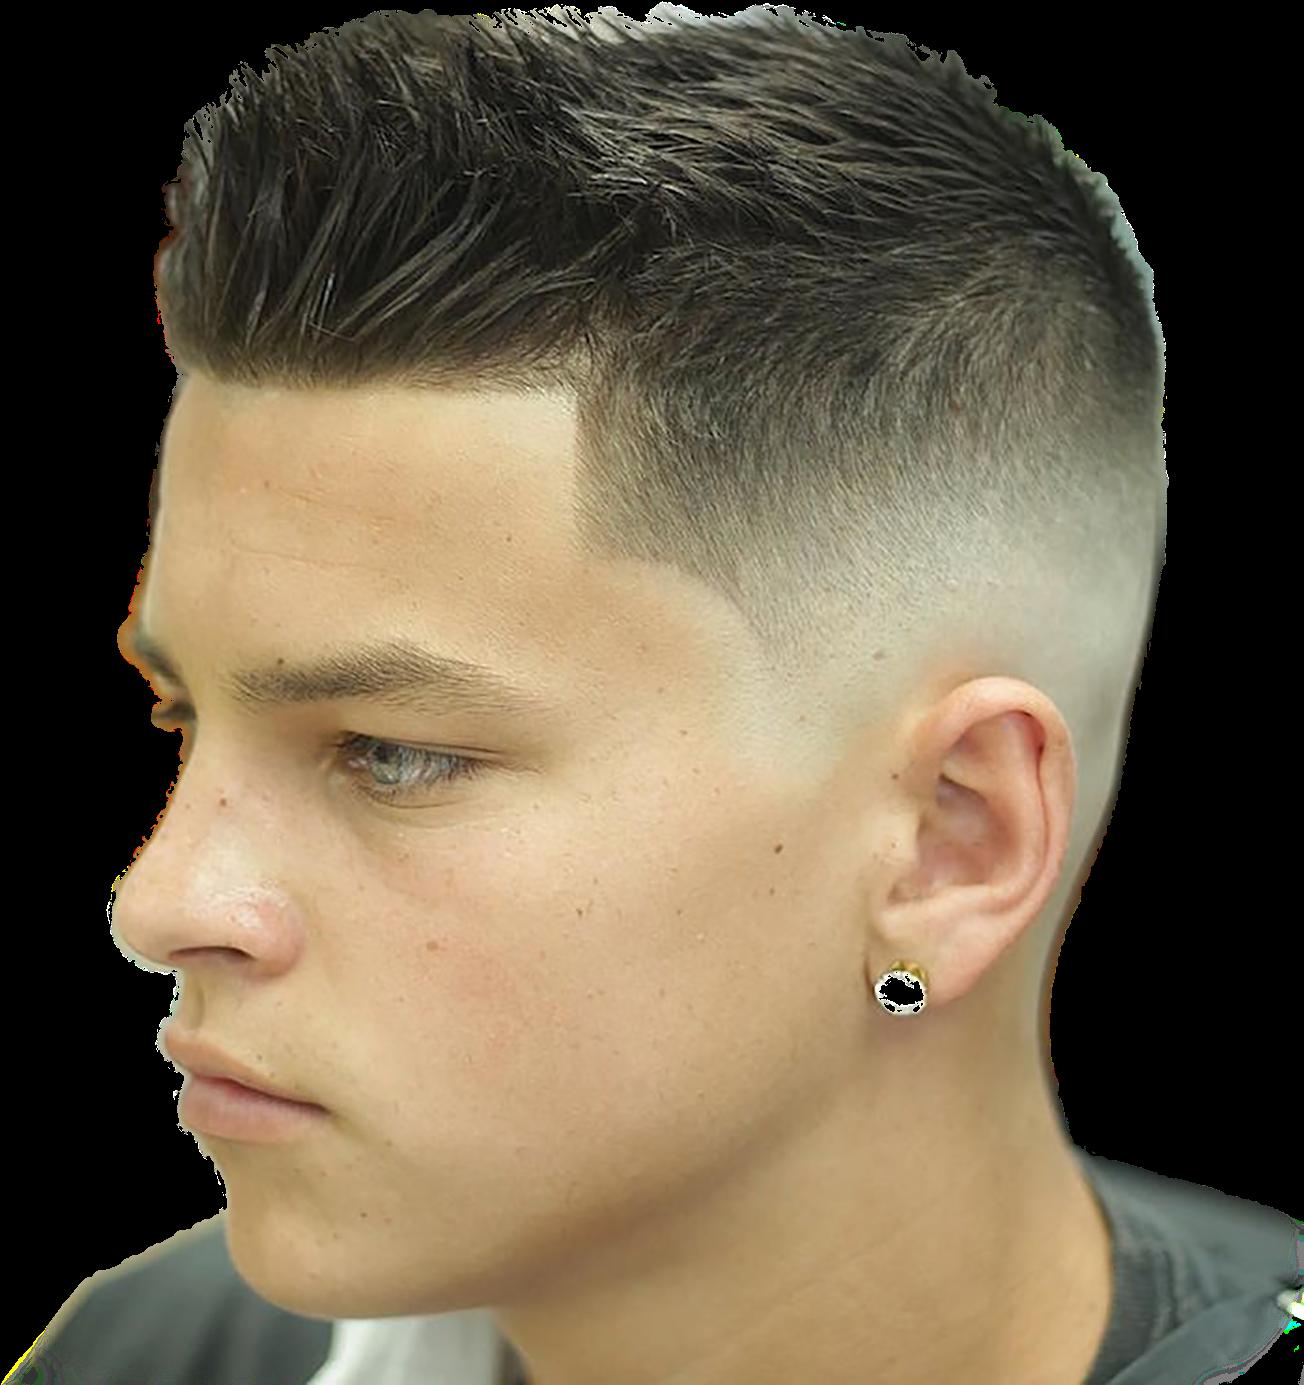 download men - mens skin fade haircut 2018 png image with no